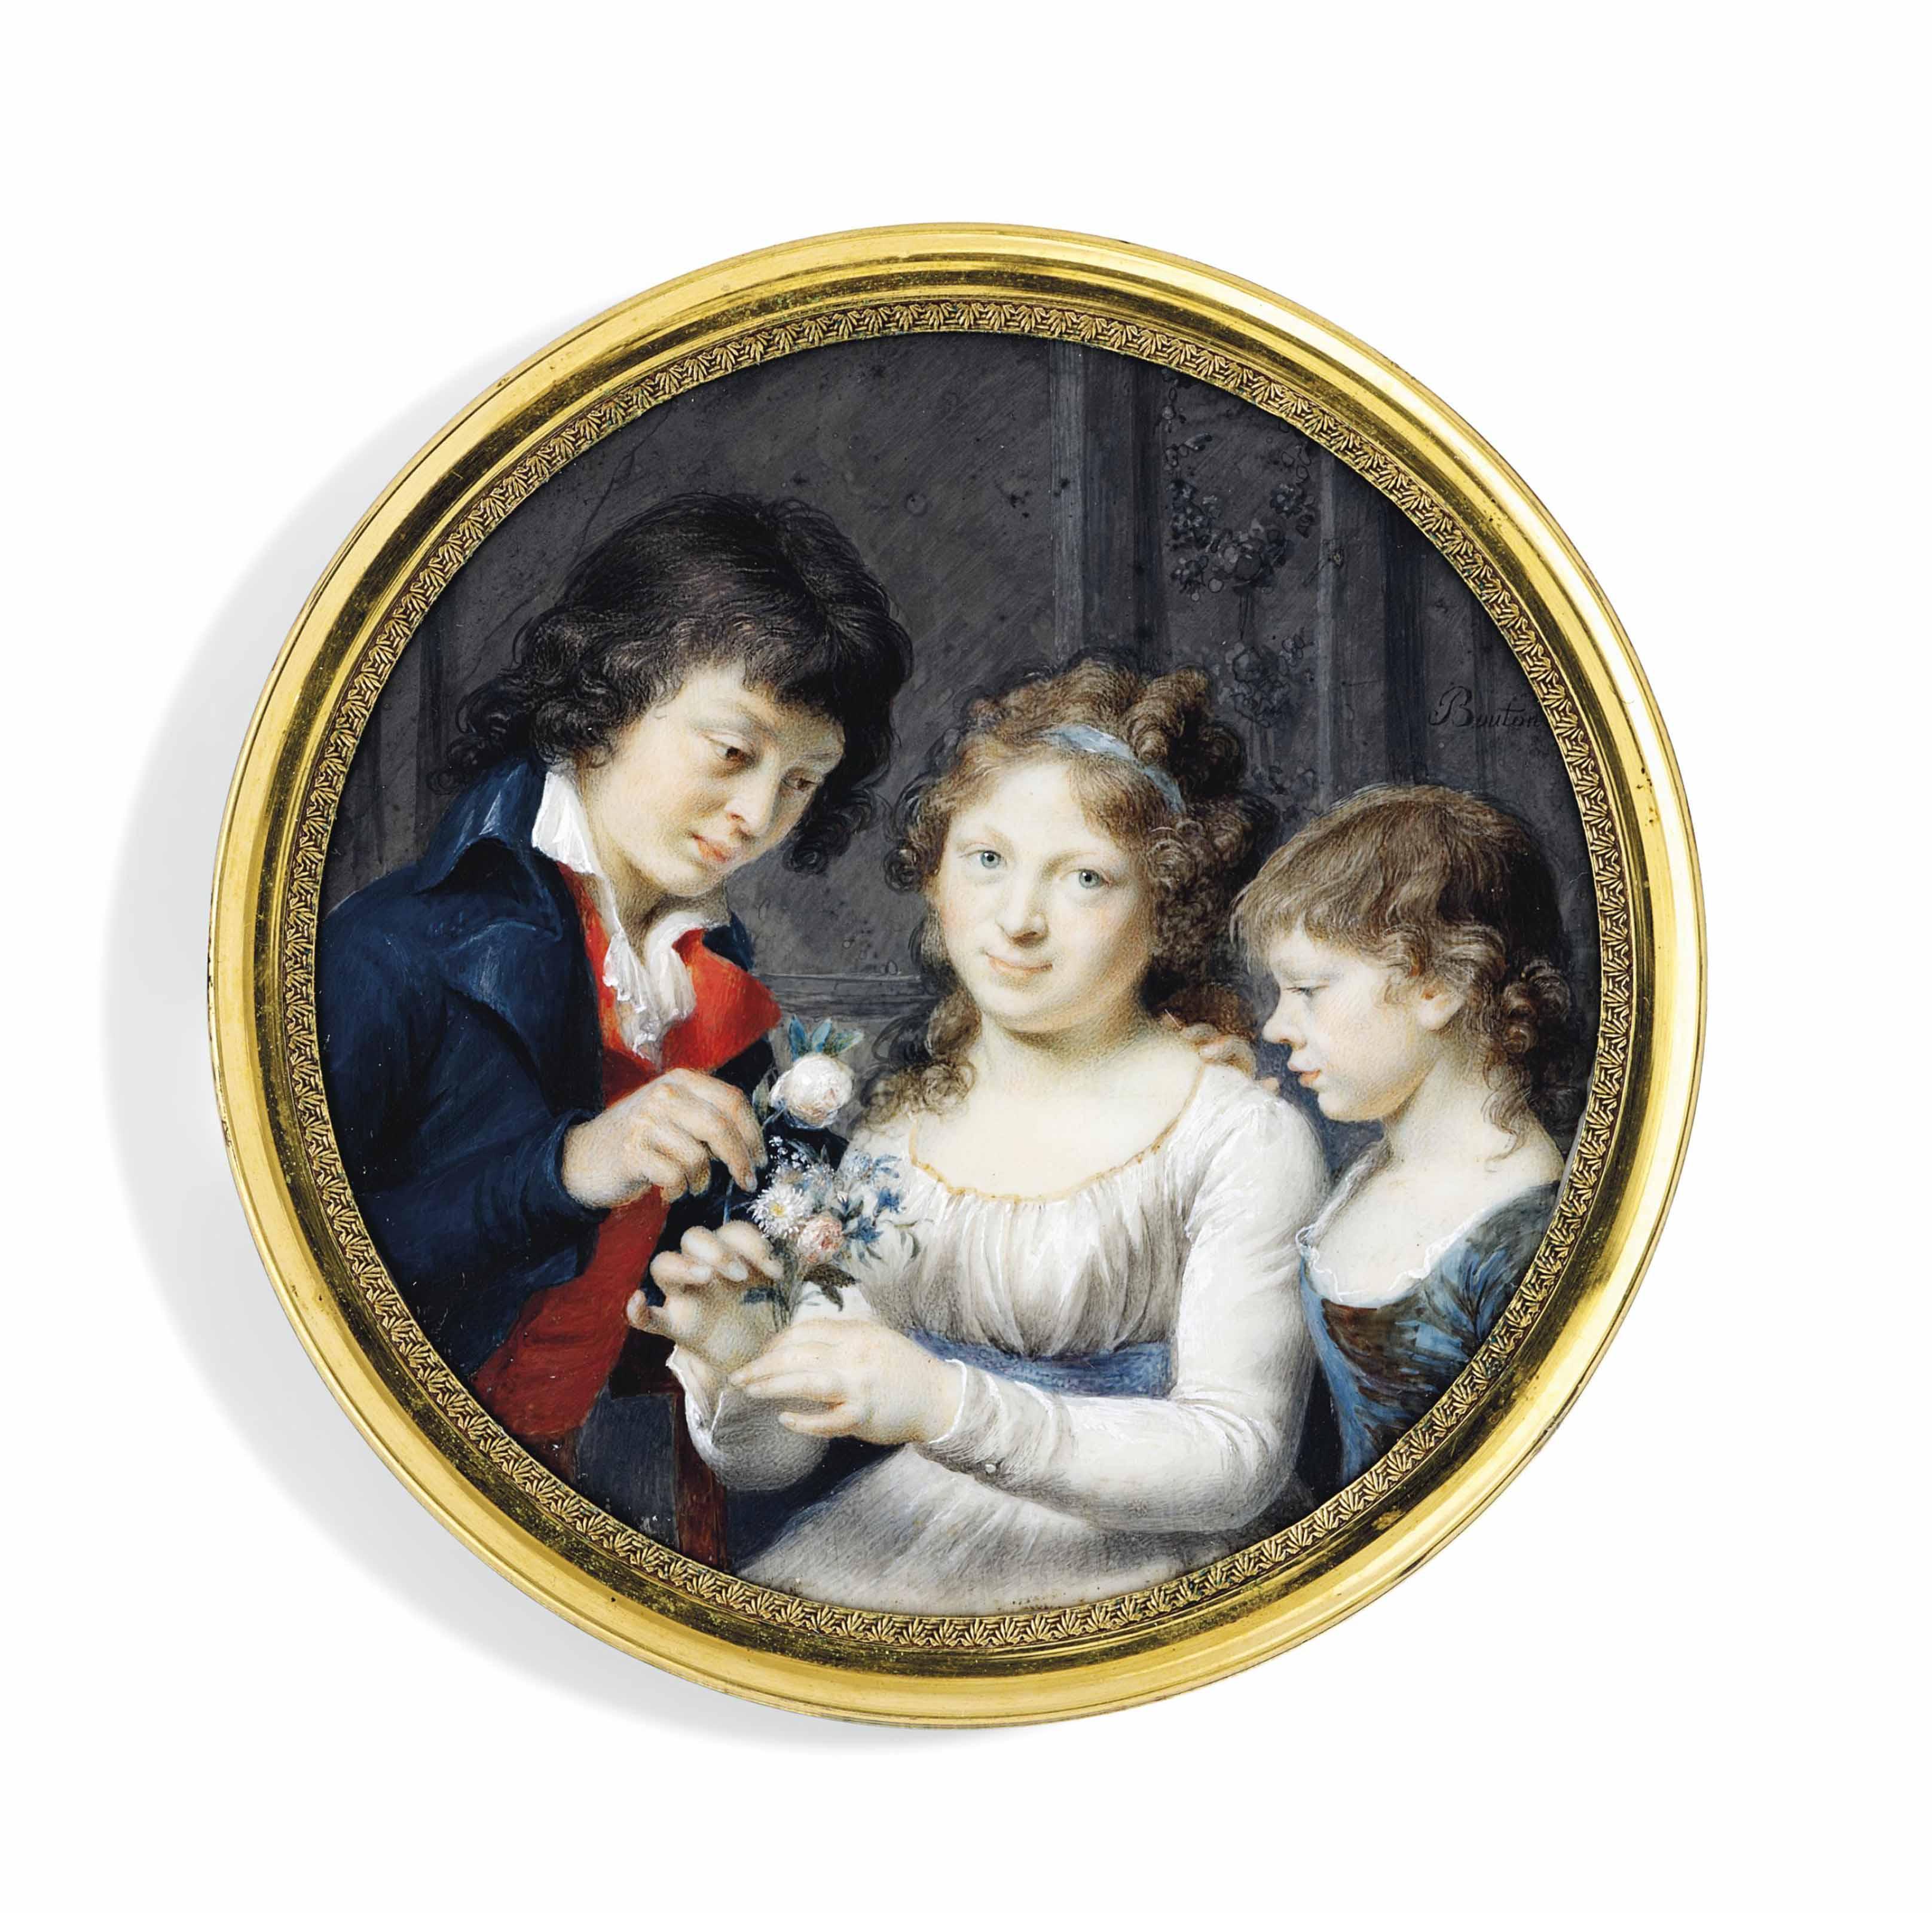 JOSEPH-MARIE BOUTON (HISPANO-FRENCH, 1768-1832)